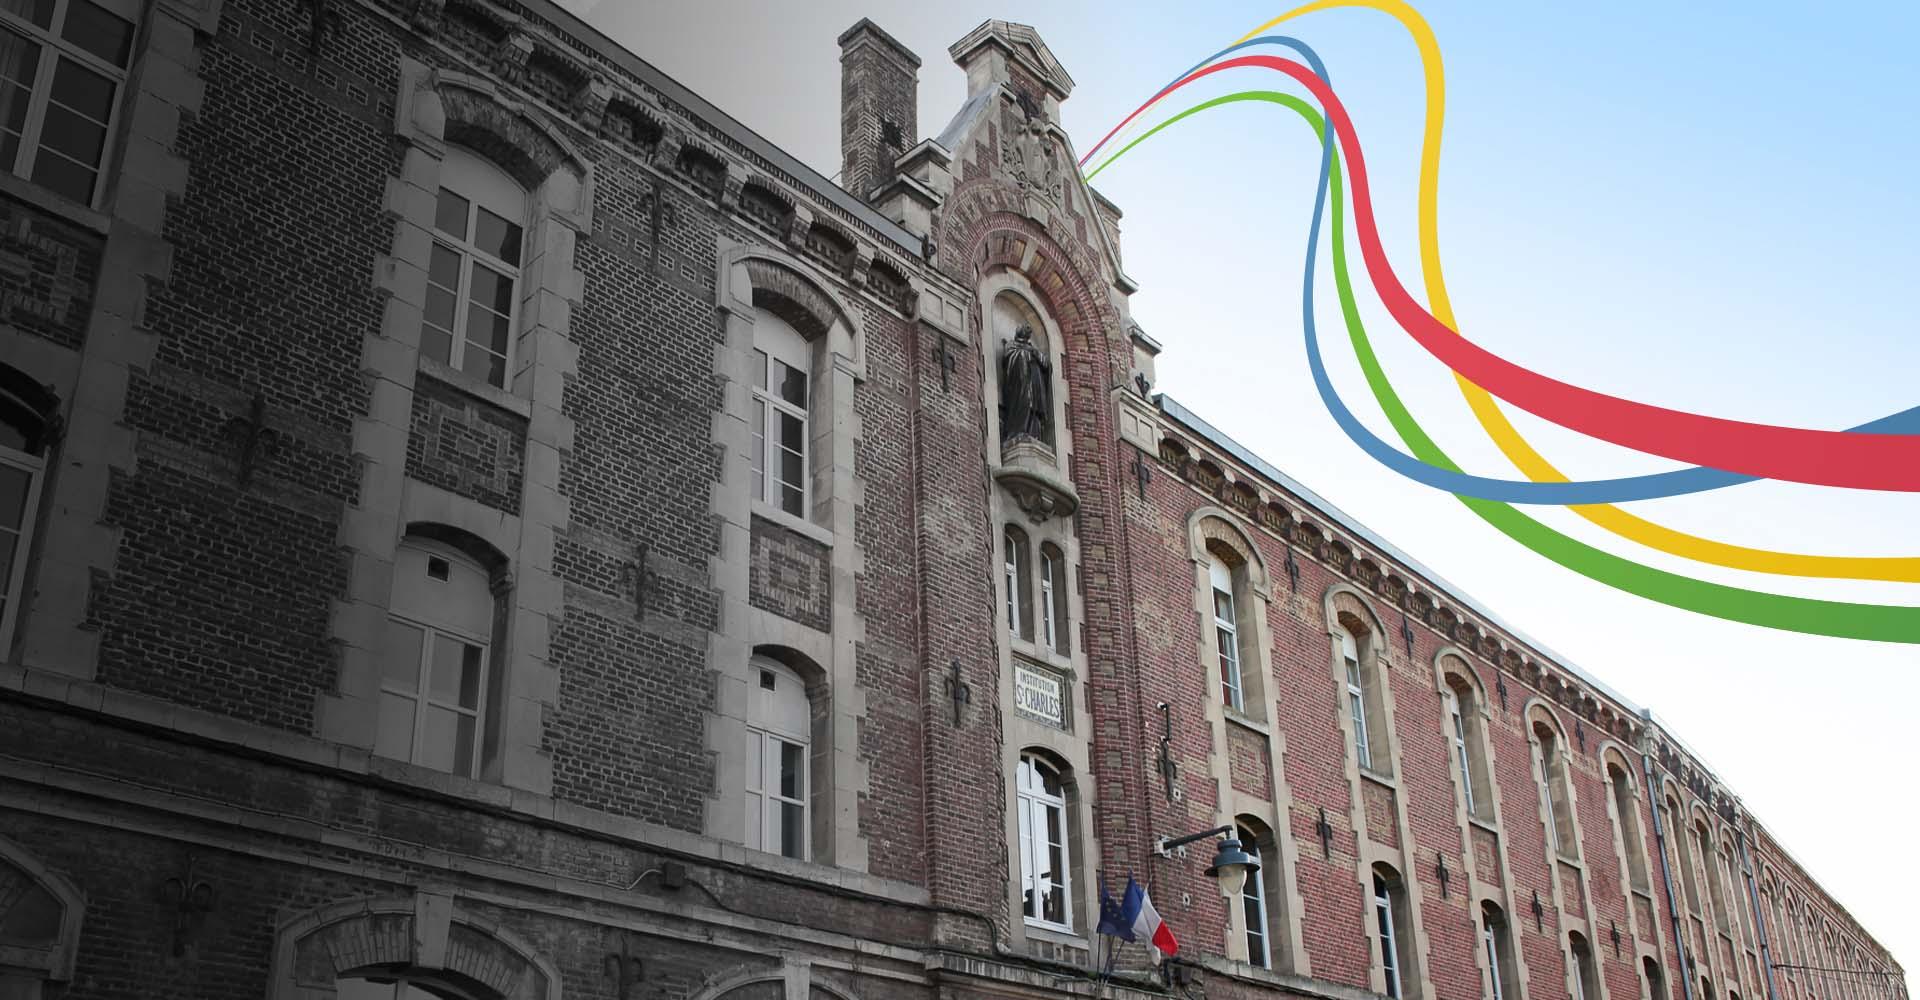 saint-charles-facade2